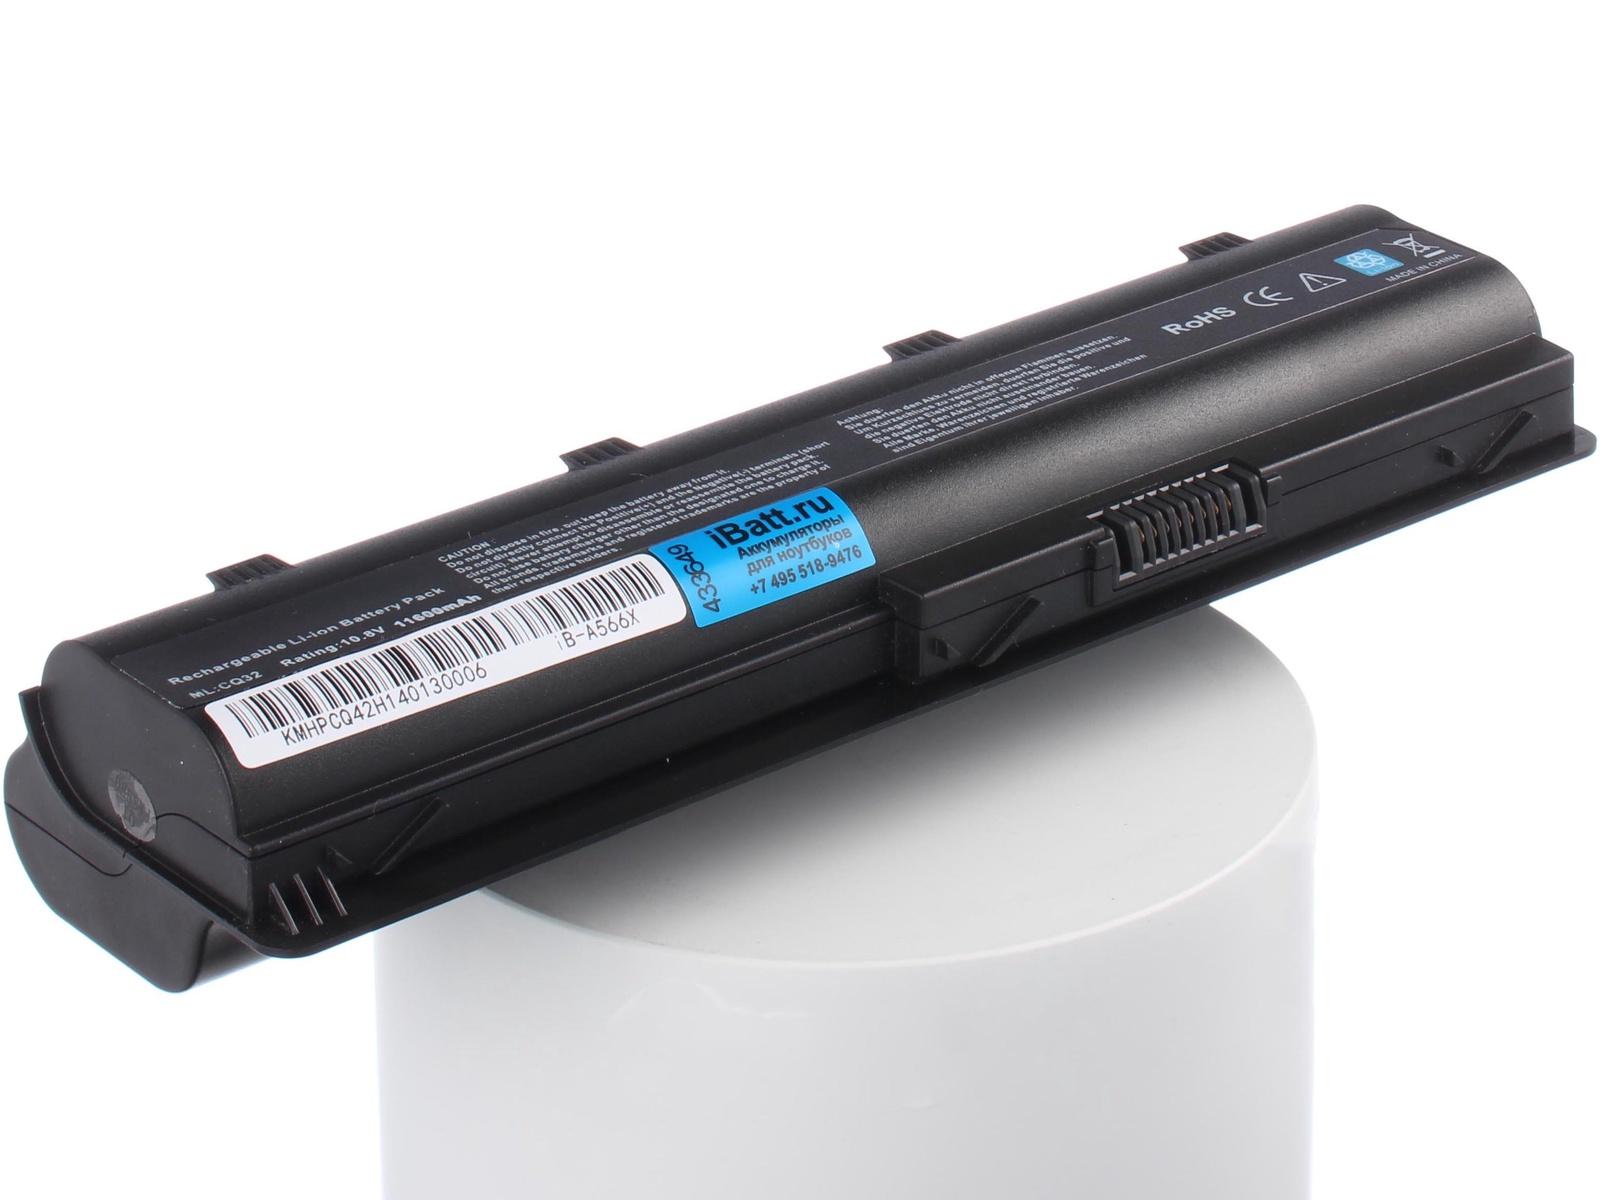 Аккумулятор для ноутбука iBatt для HP-Compaq G72-b01ER, dv6-6029er, Pavilion dv6-3123er, Pavilion dv6-3101er, Pavilion dv6-3111er, Pavilion dv6-3080er, Pavilion g7-1200er, Pavilion dv6-6051er, Pavilion g6-1304er, G72-a20ER